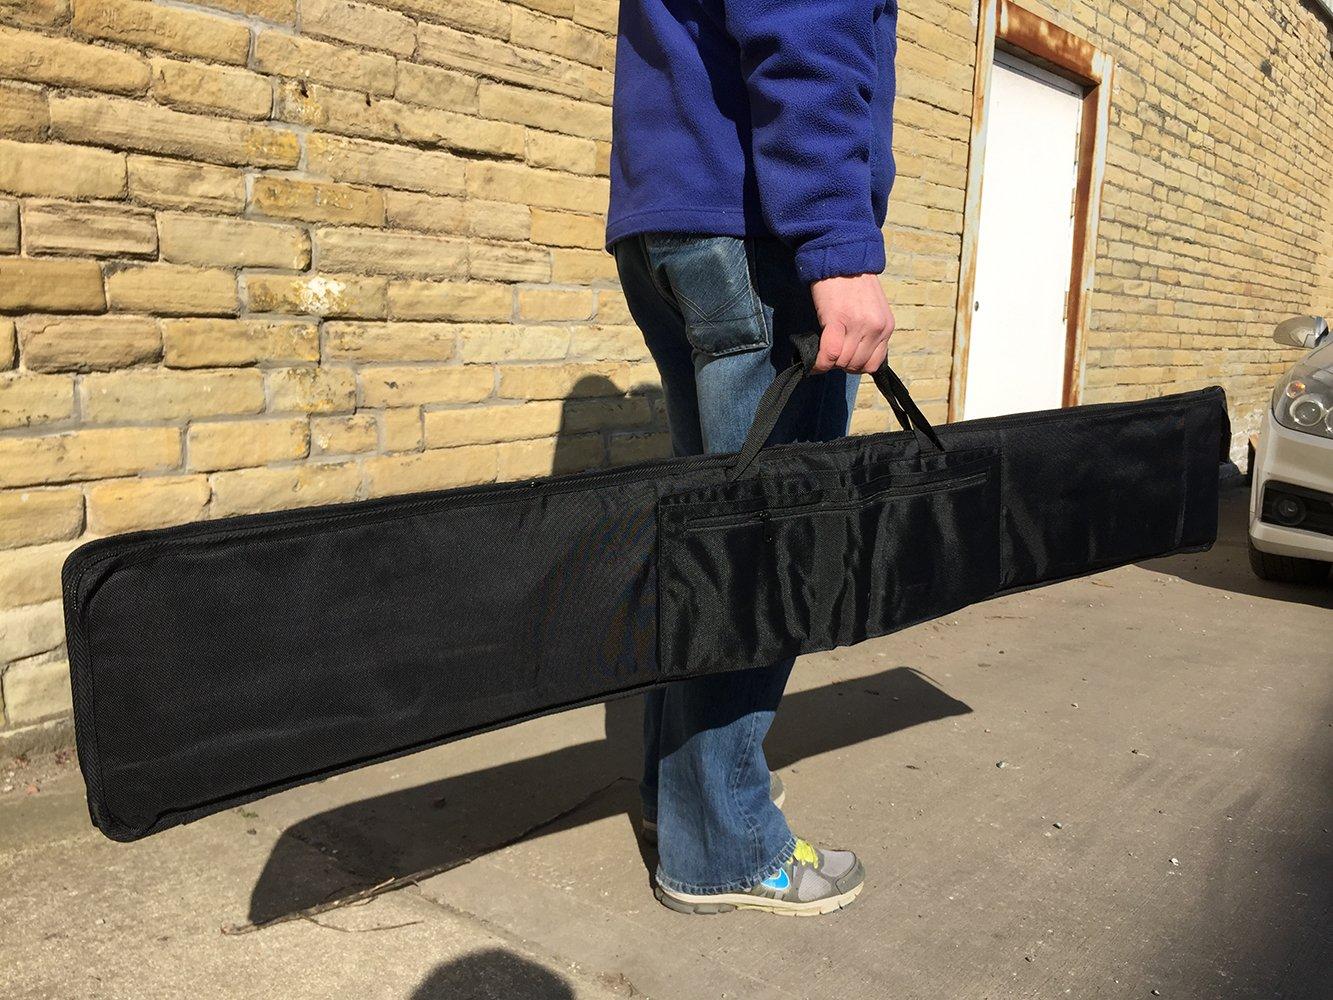 GUIDE RAIL BAG CARRY CASE FOR MAKITA SP6000 1.4M GUIDE RAILS GUIDE TRACK BAG